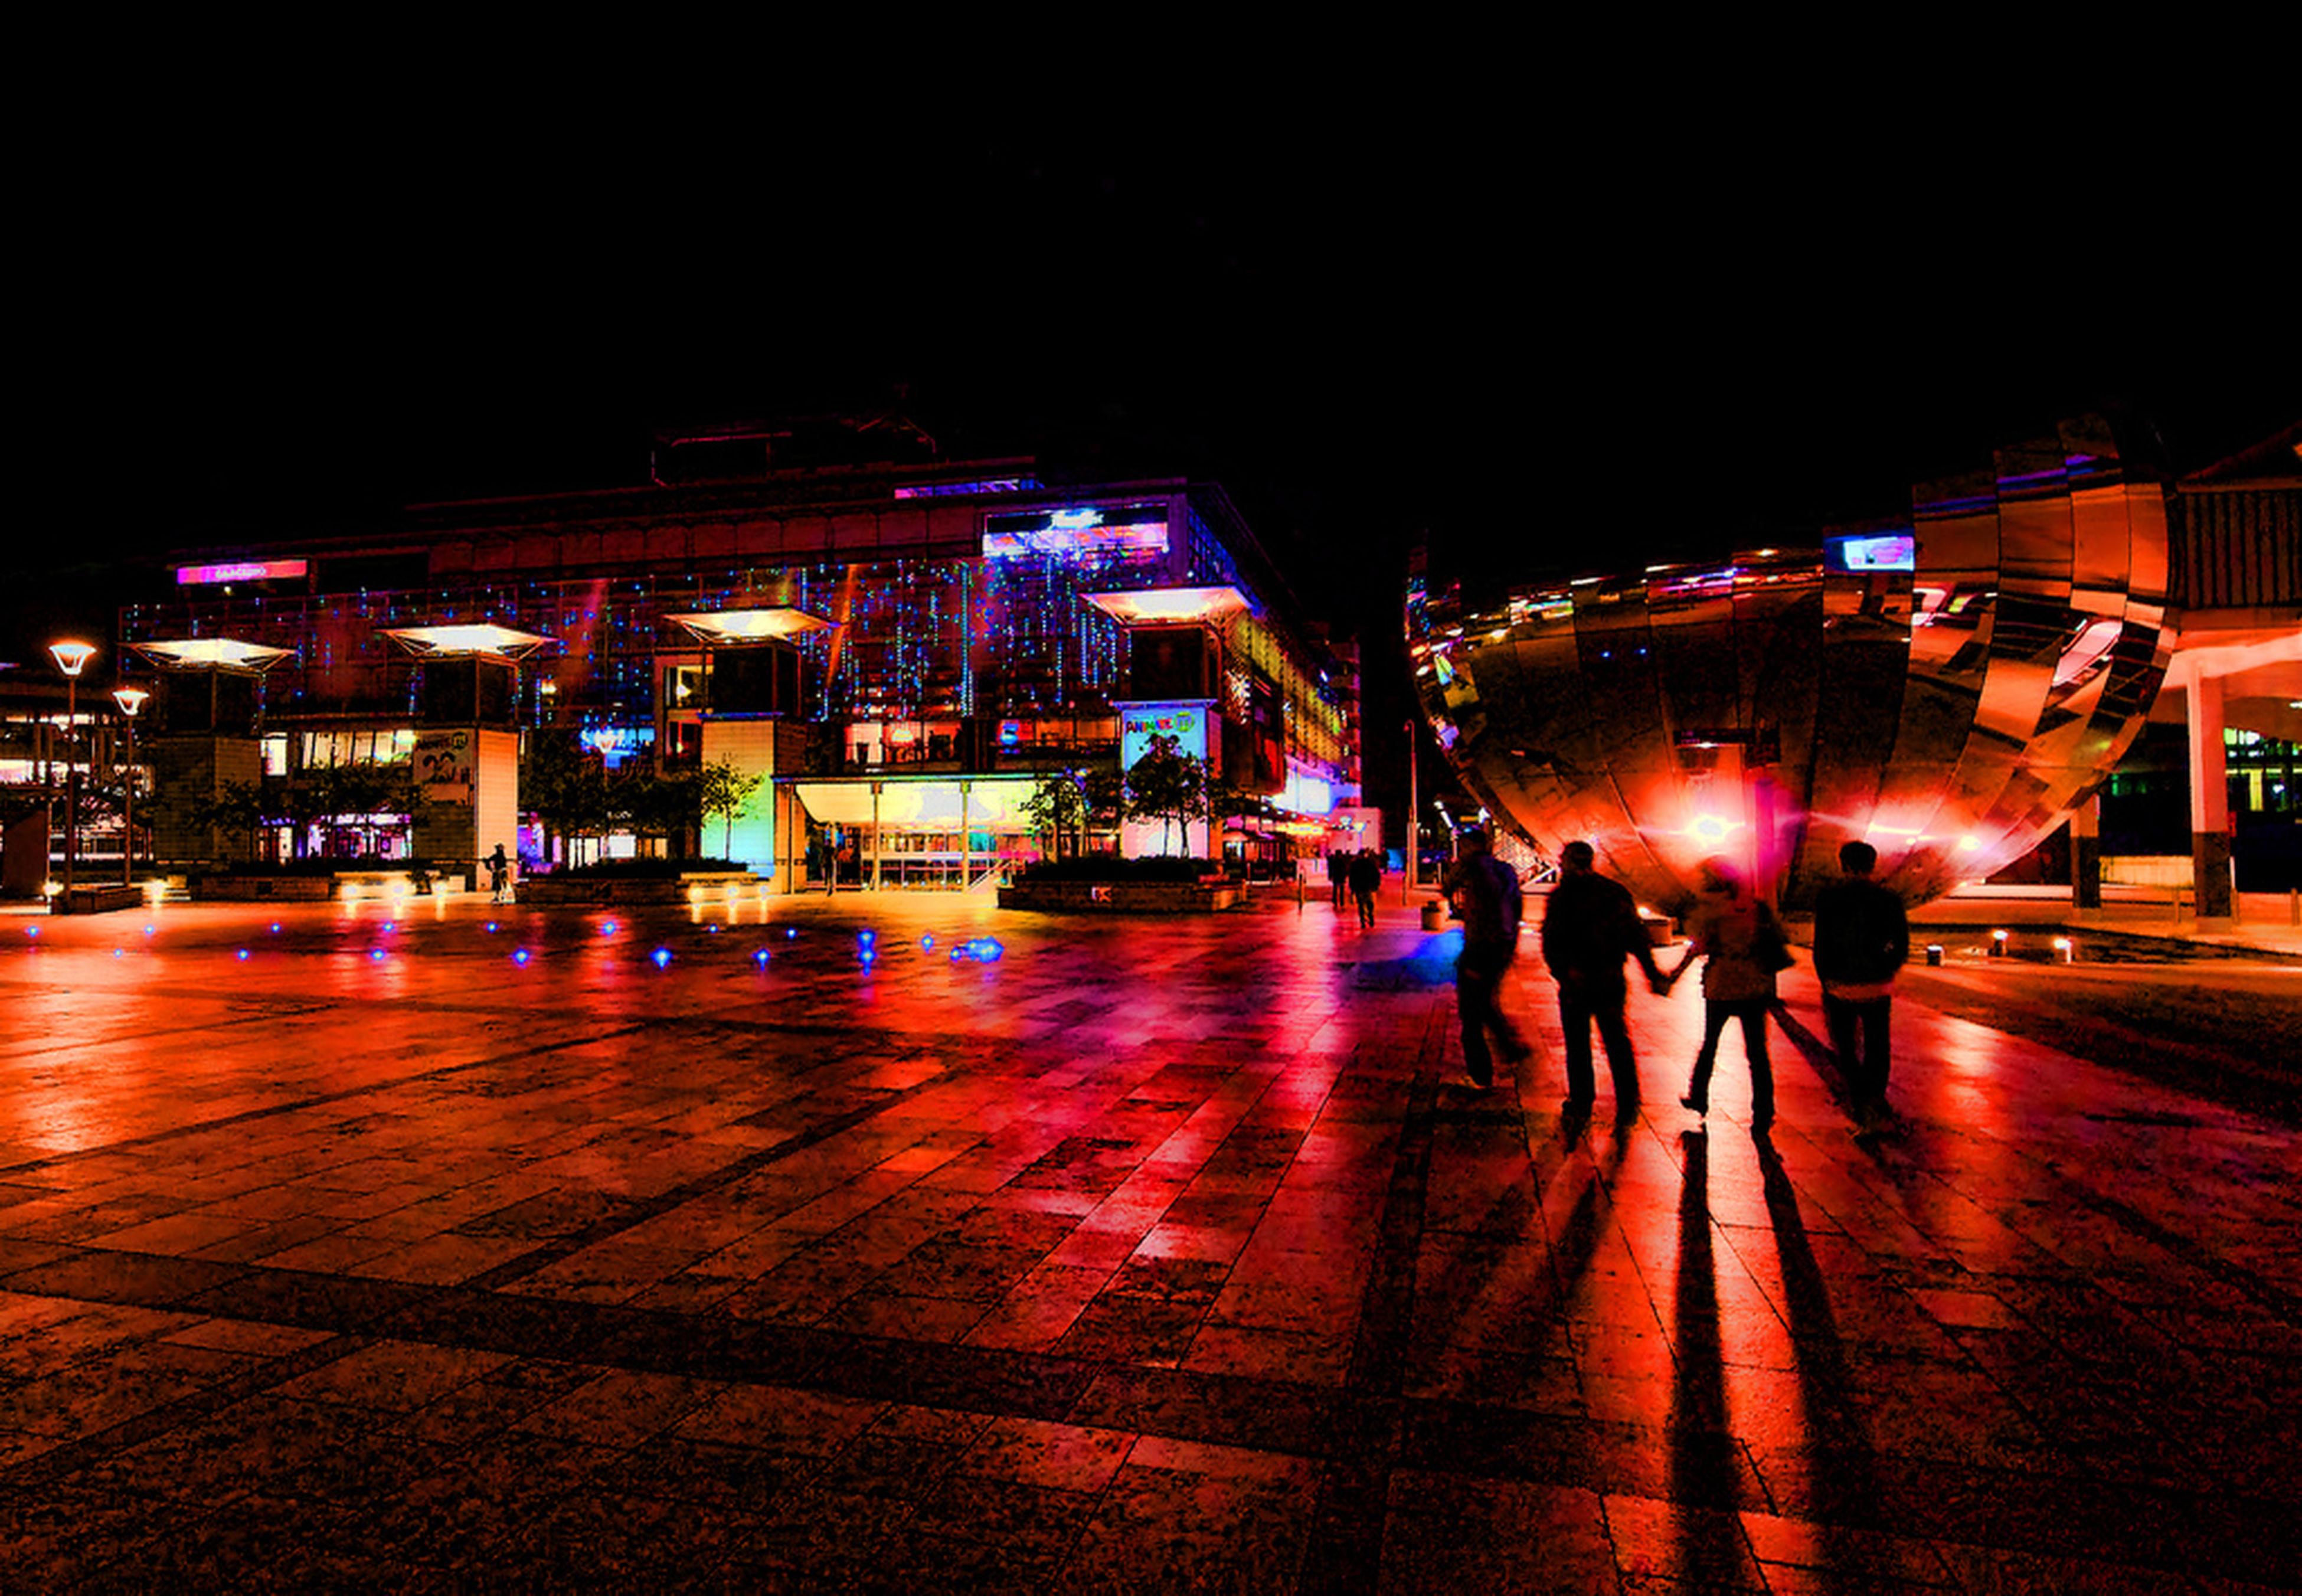 night, illuminated, building exterior, city, architecture, built structure, city life, street, walking, lifestyles, men, person, leisure activity, full length, blurred motion, motion, sidewalk, lighting equipment, city street